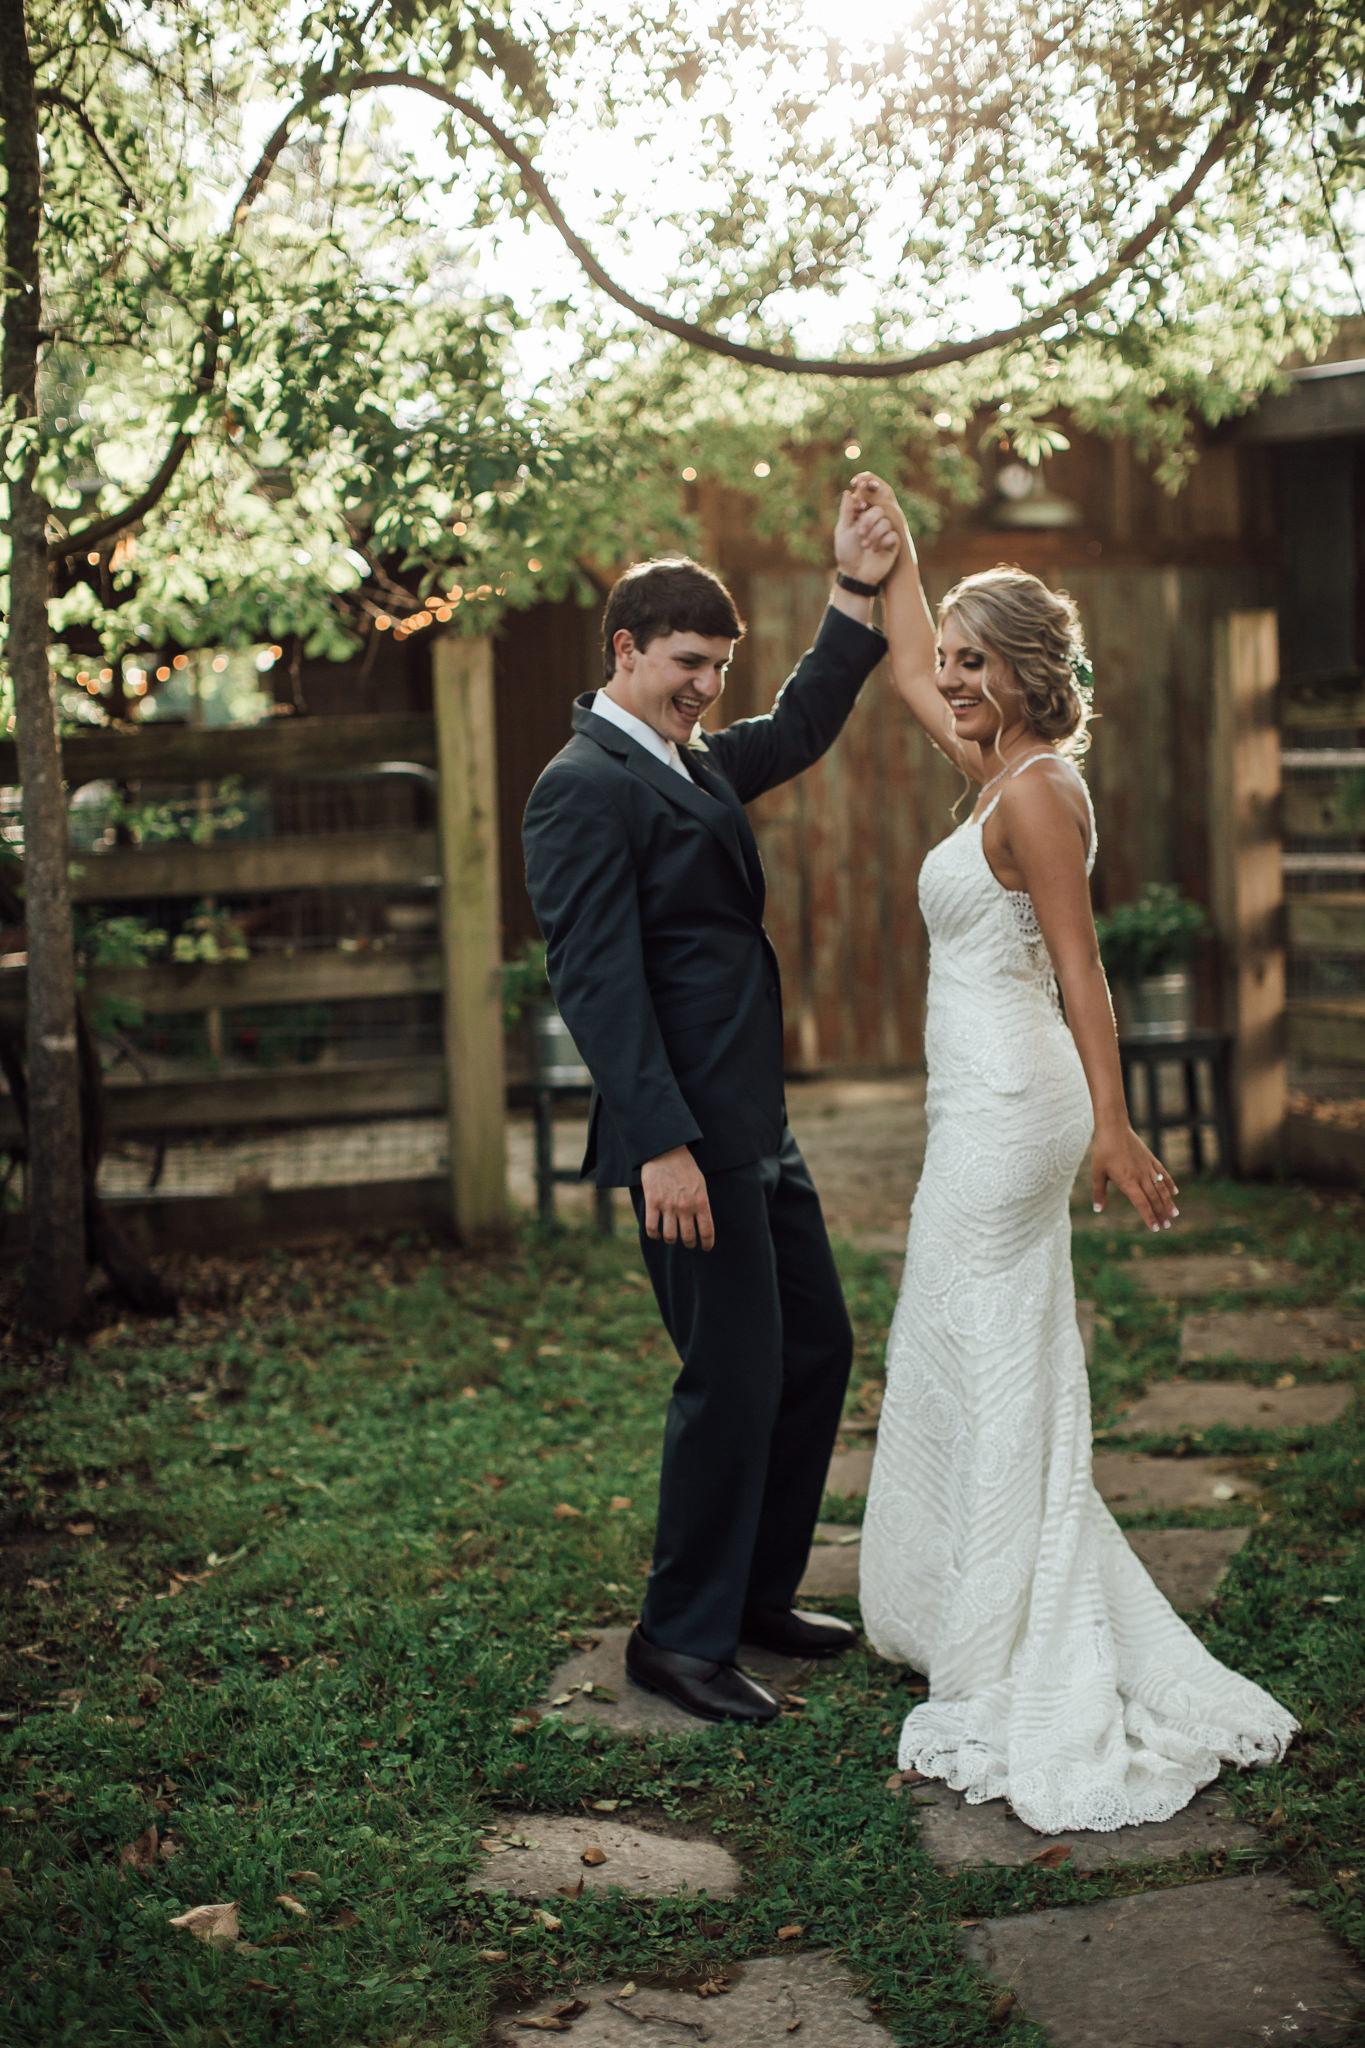 cassie-cook-photography-memphis-wedding-photographer-hedge-farm-wedding-venue-212.jpg